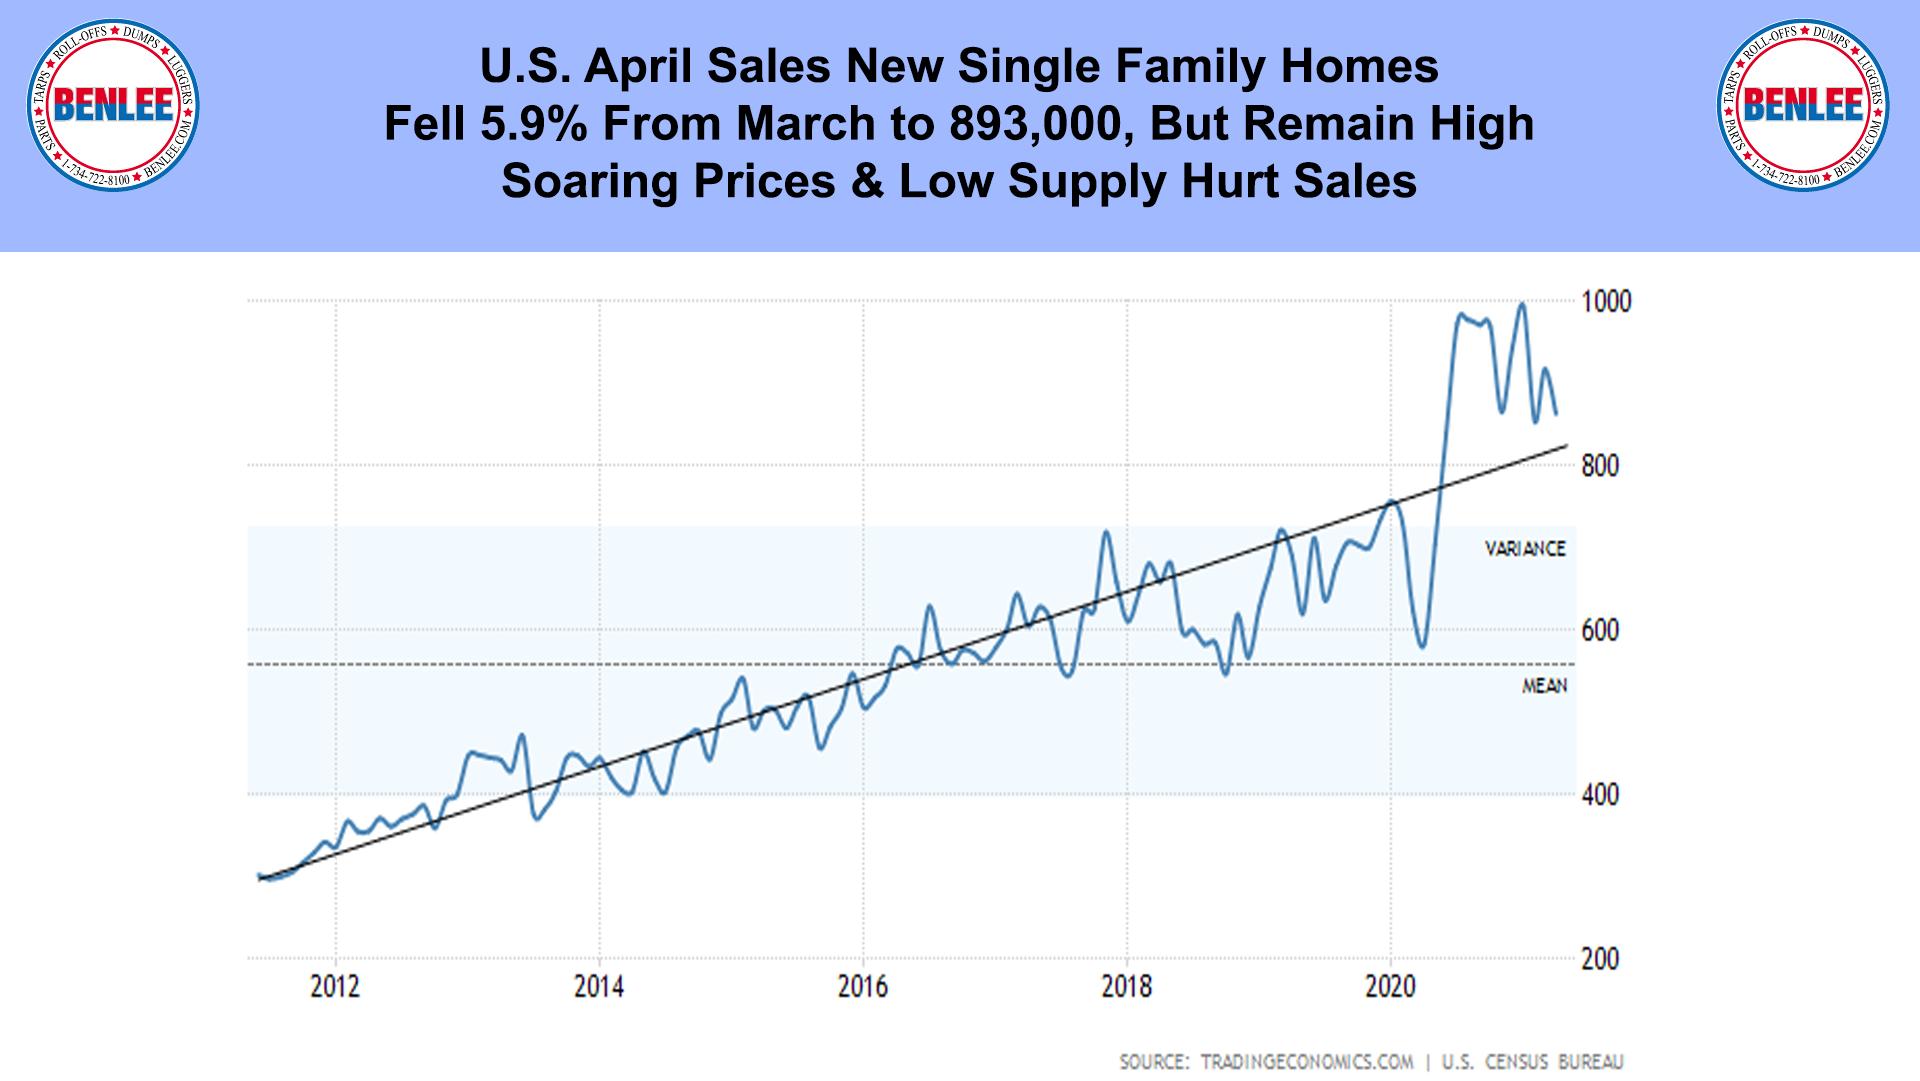 U.S. April Sales New Single Family Homes